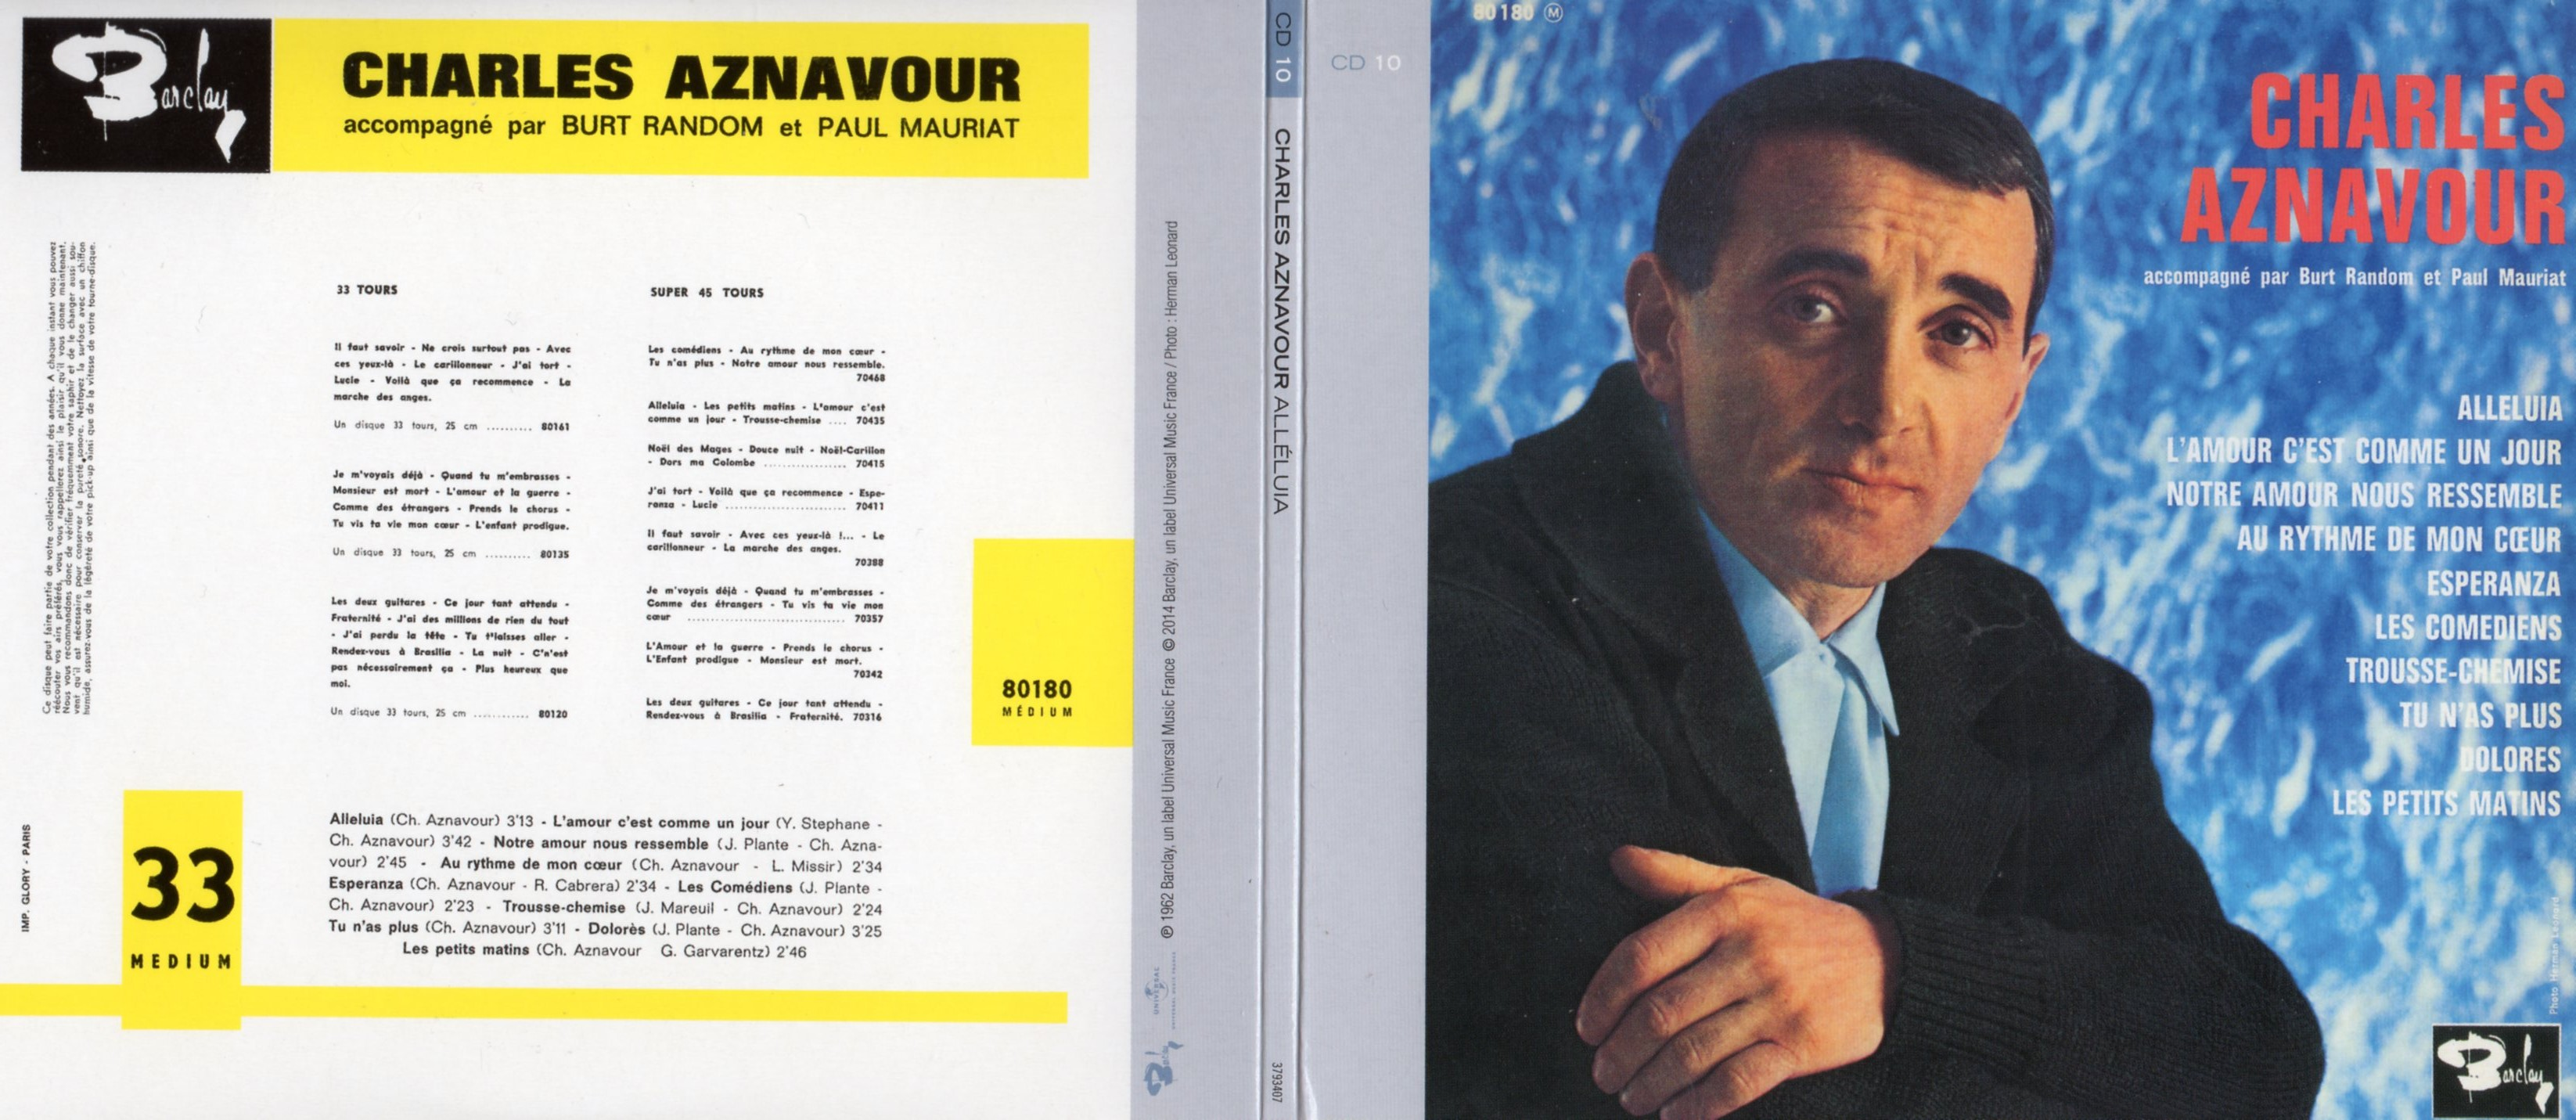 CHARLES AZNAVOUR - Alléluia (1962) Gatefold Card board sleeve Replica - CD